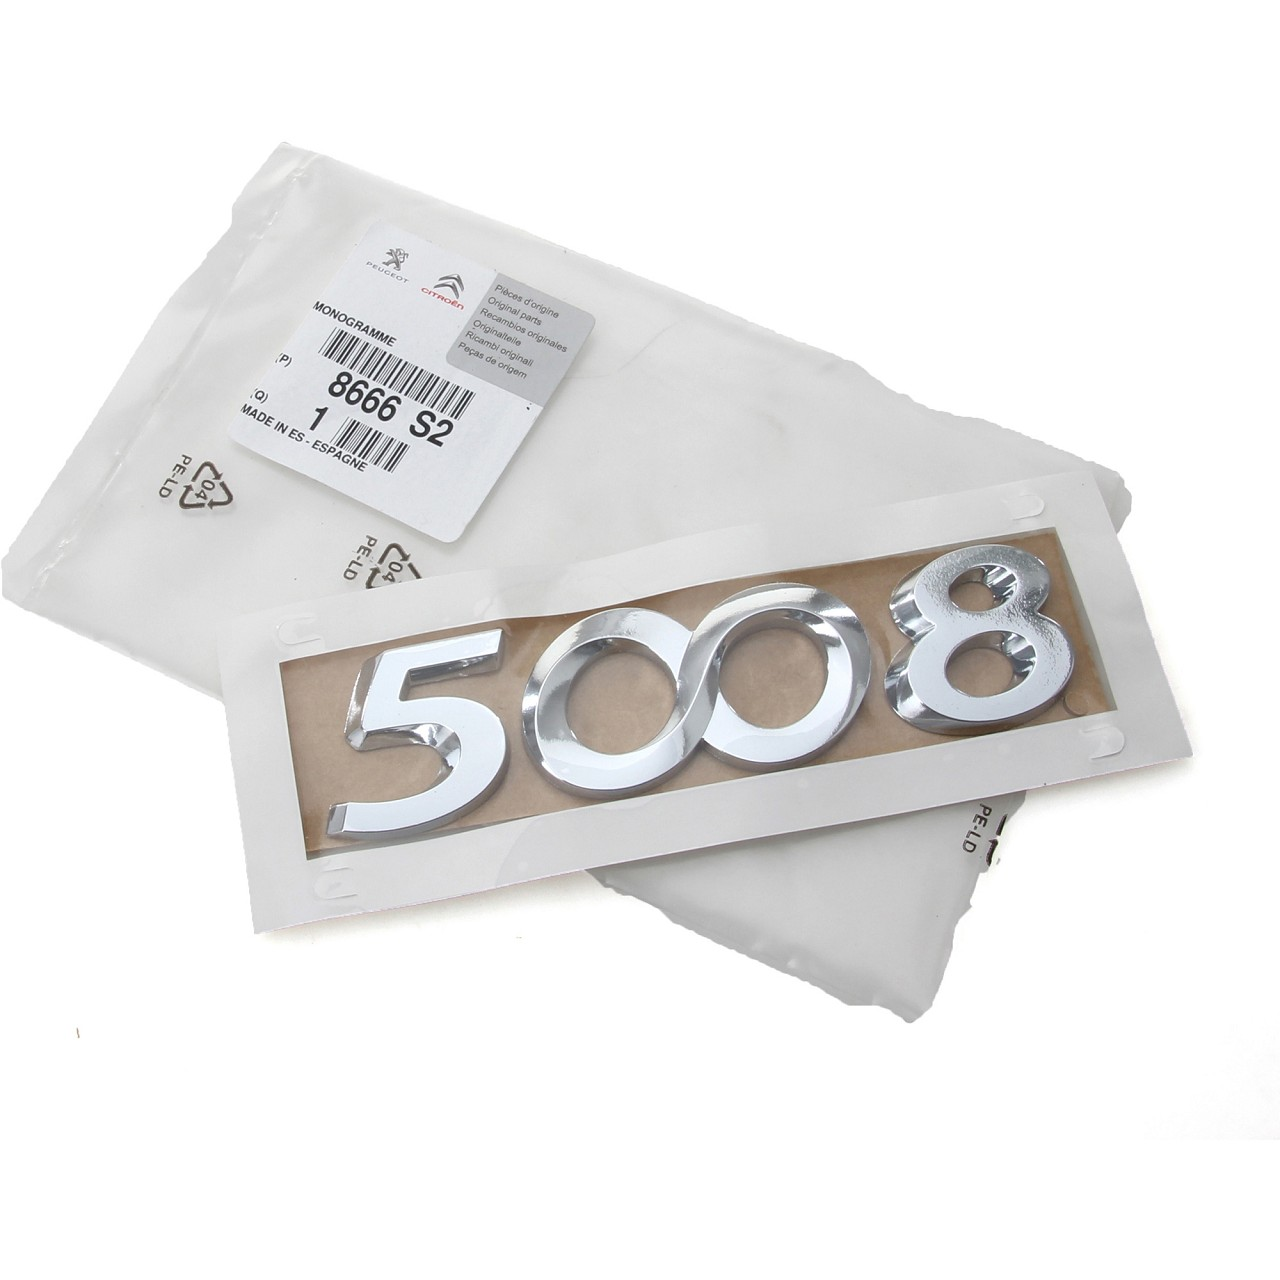 ORIGINAL Peugeot Emblem Plakette Logo Schriftzug Heckklappe 5008 8666.S2